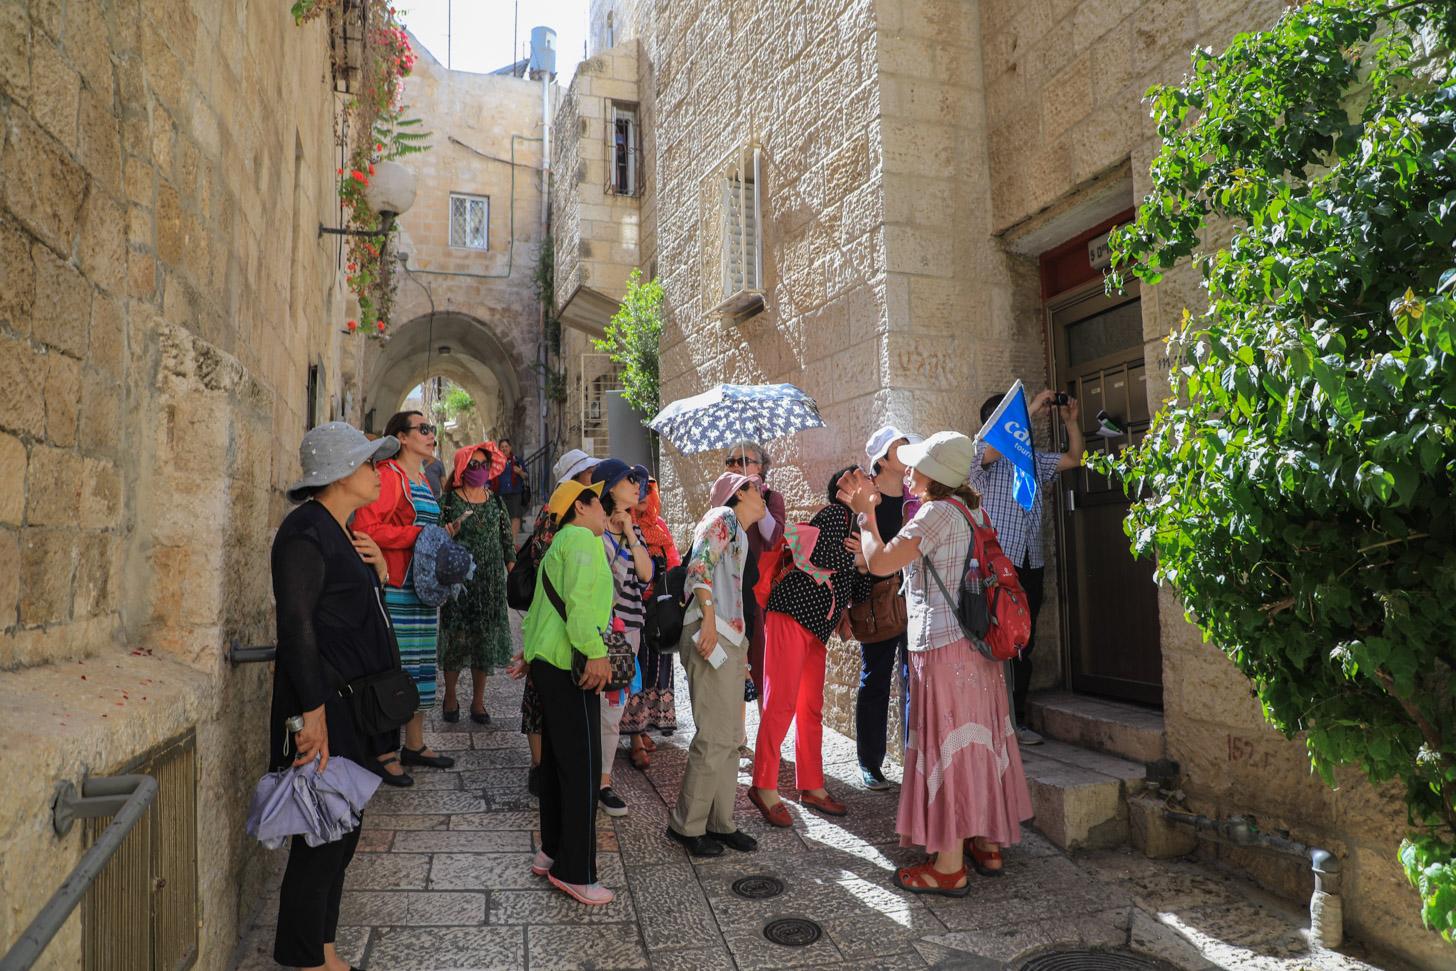 Jeruzalem bezoeken